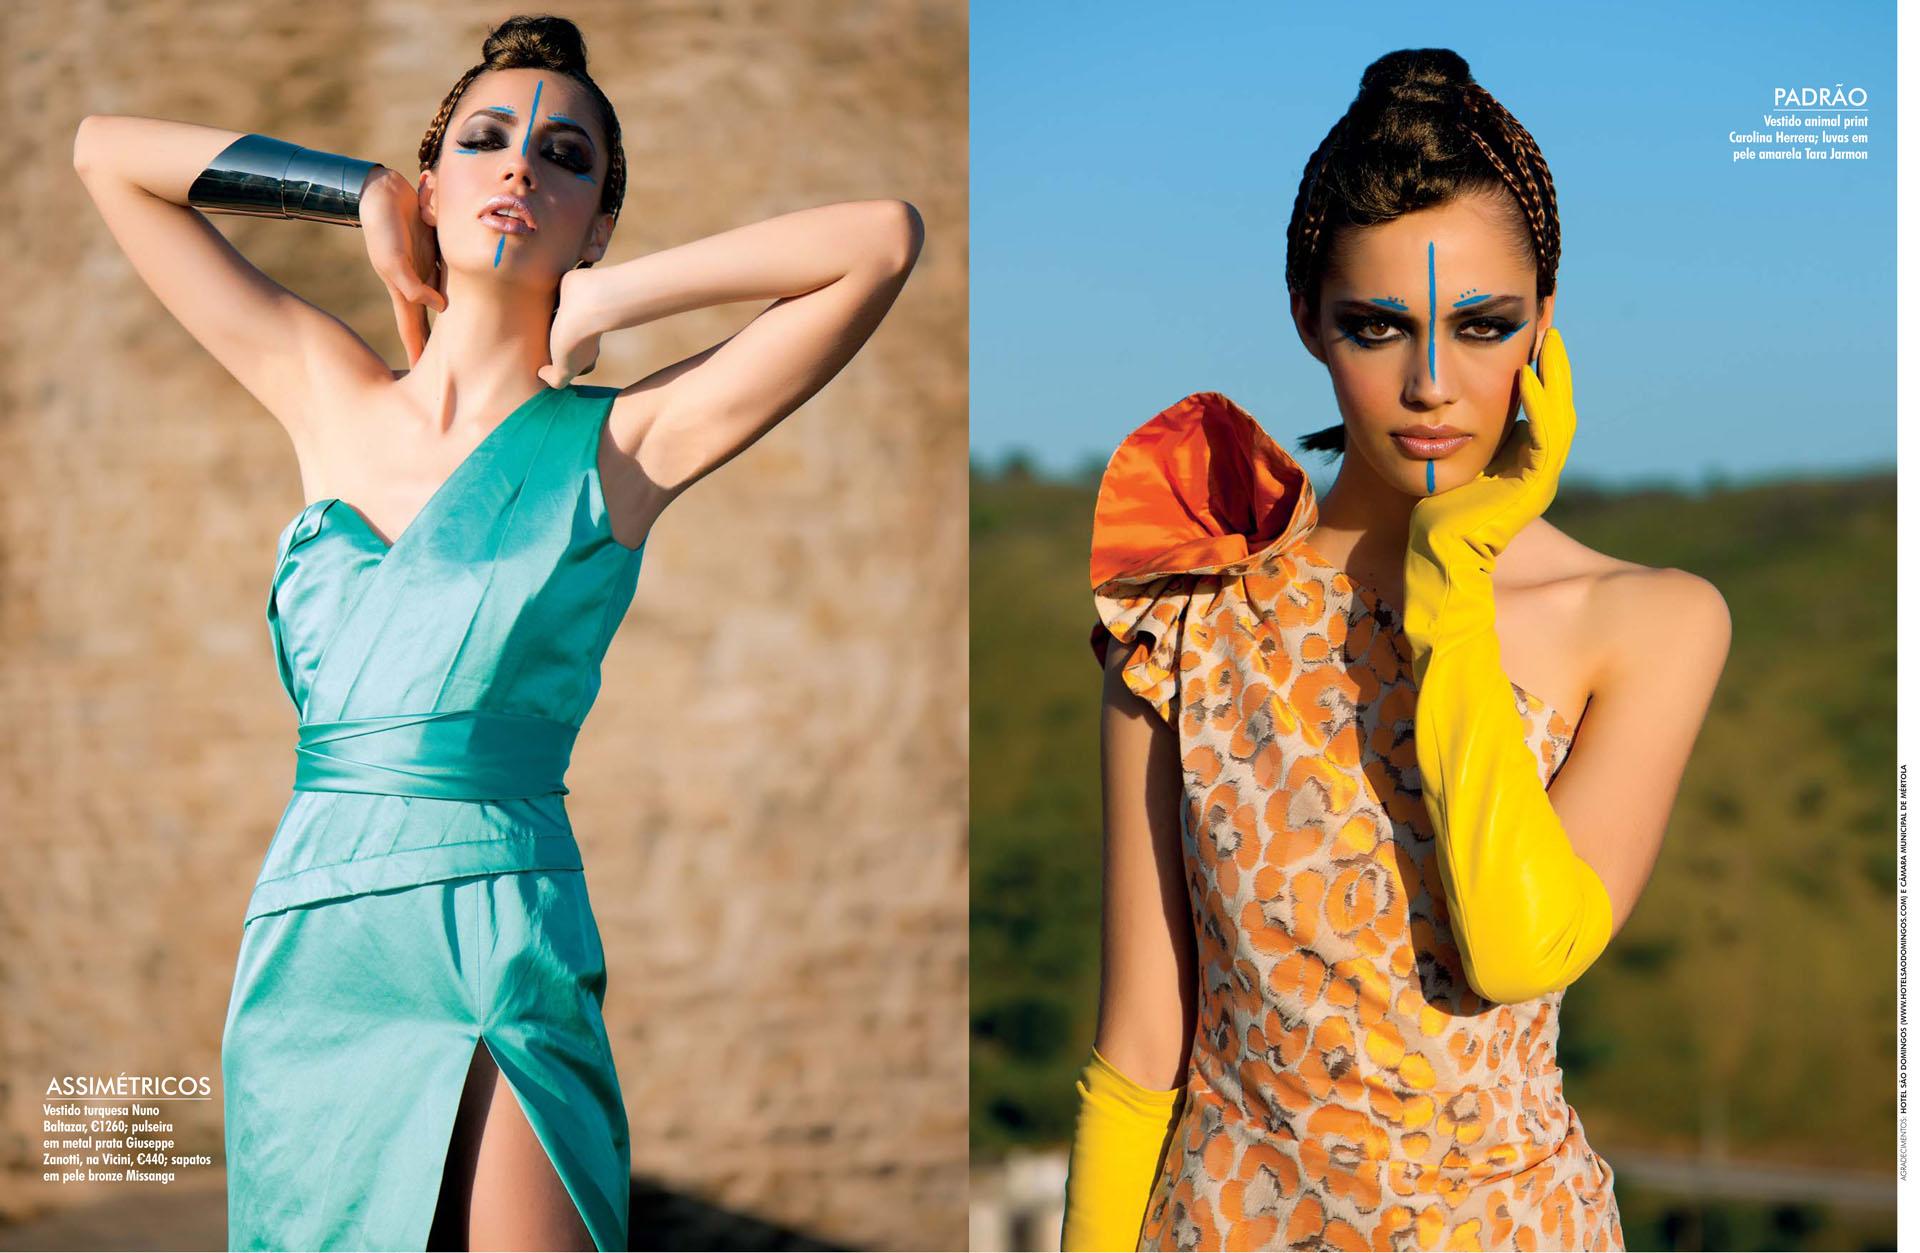 moda-vera%cc%83o-mertola_photo-alexferro-com-br-03